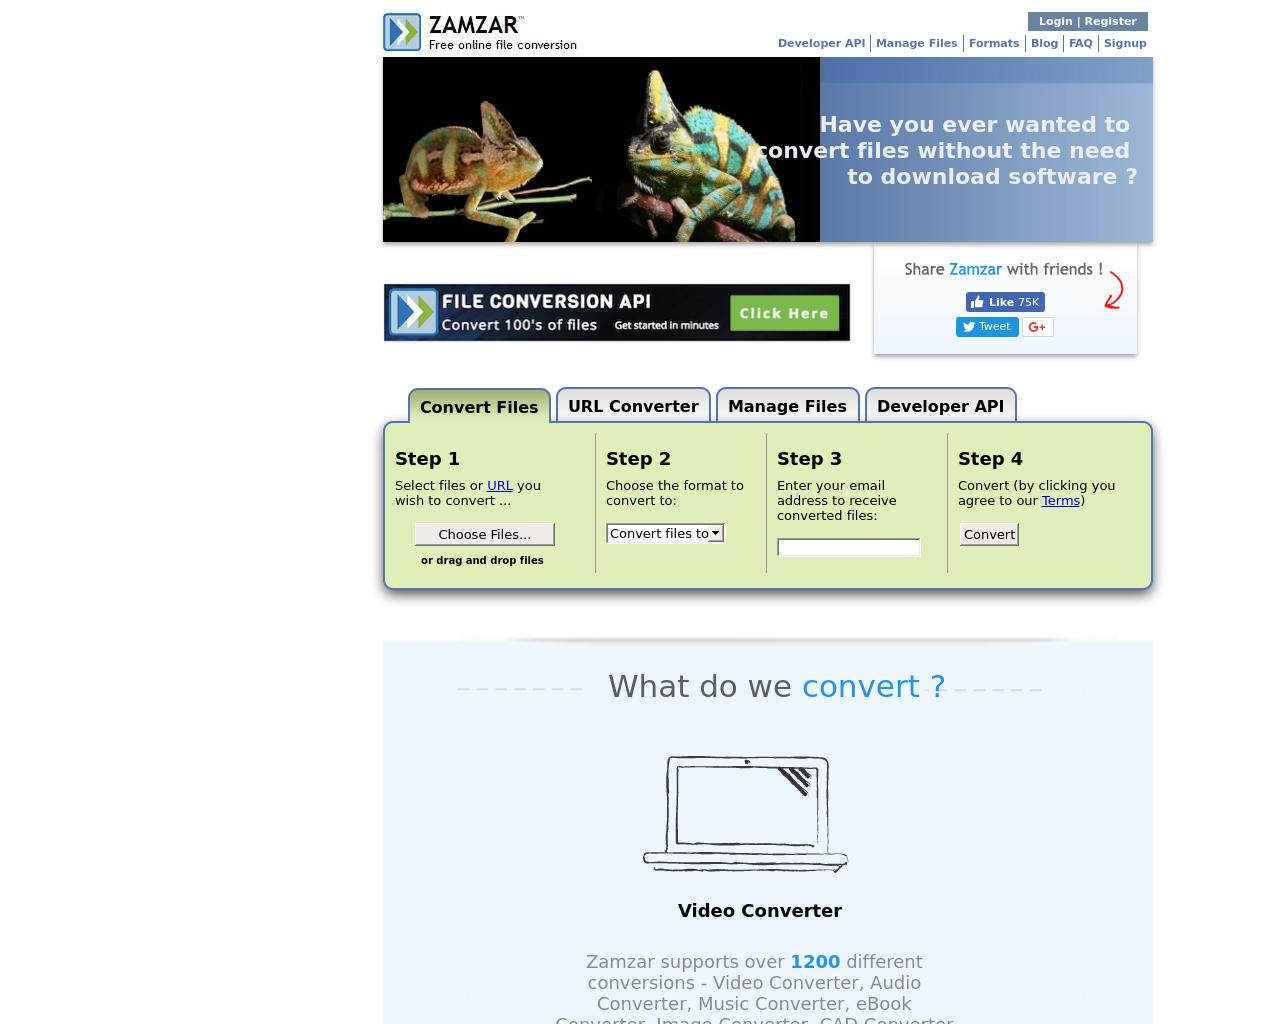 Zamzar-Advertising-Reviews-Pricing